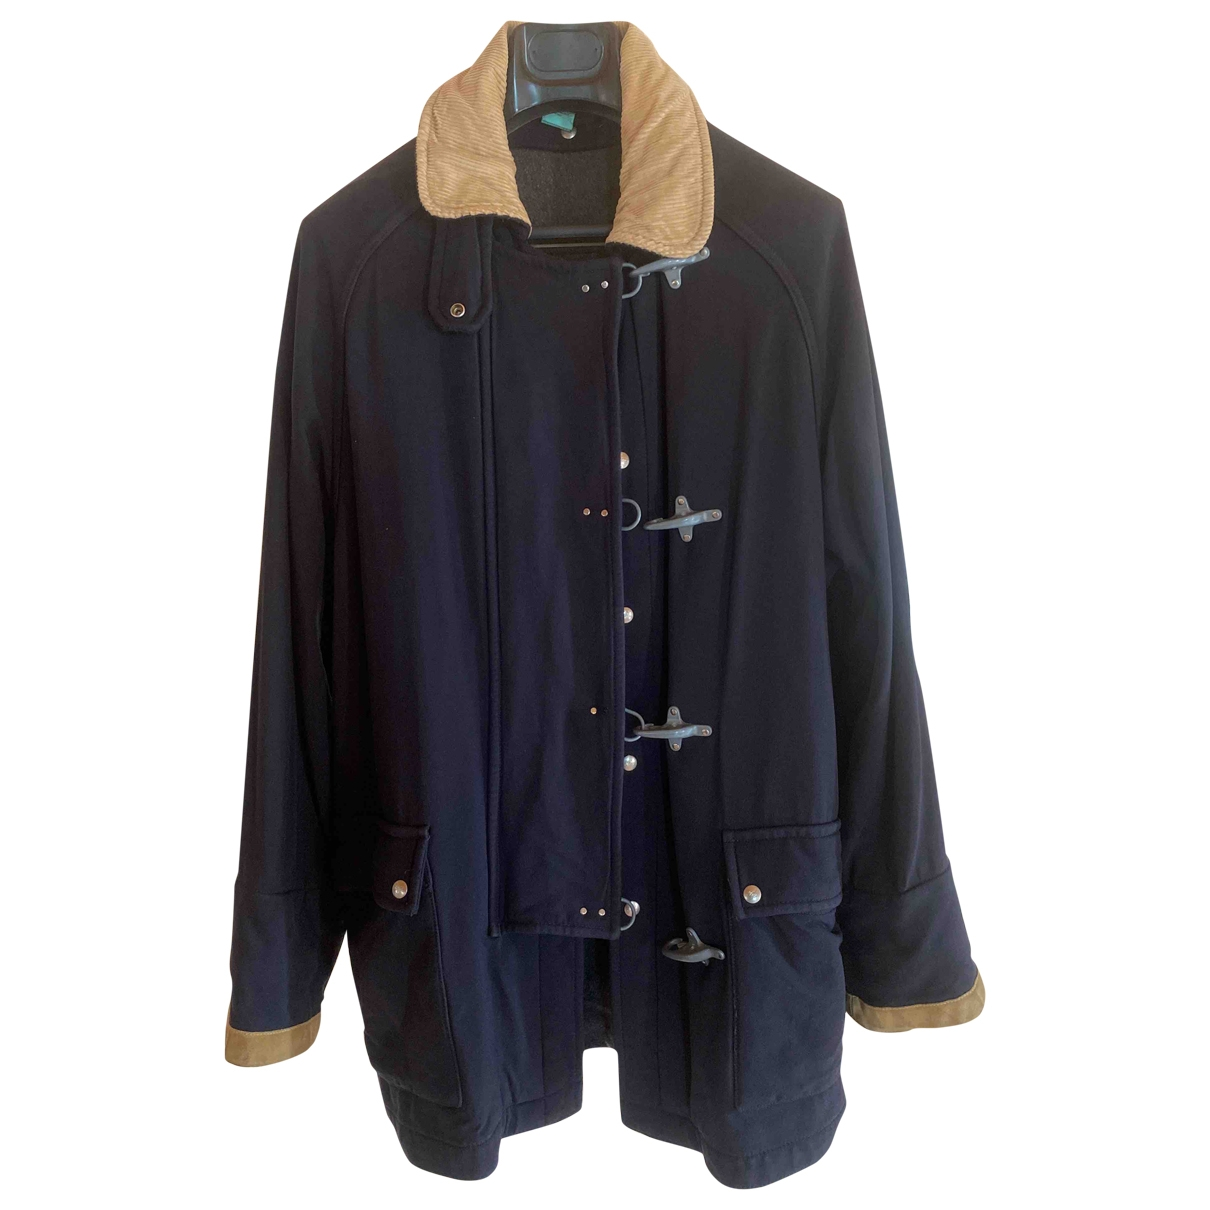 Fay \N Blue jacket  for Men M International